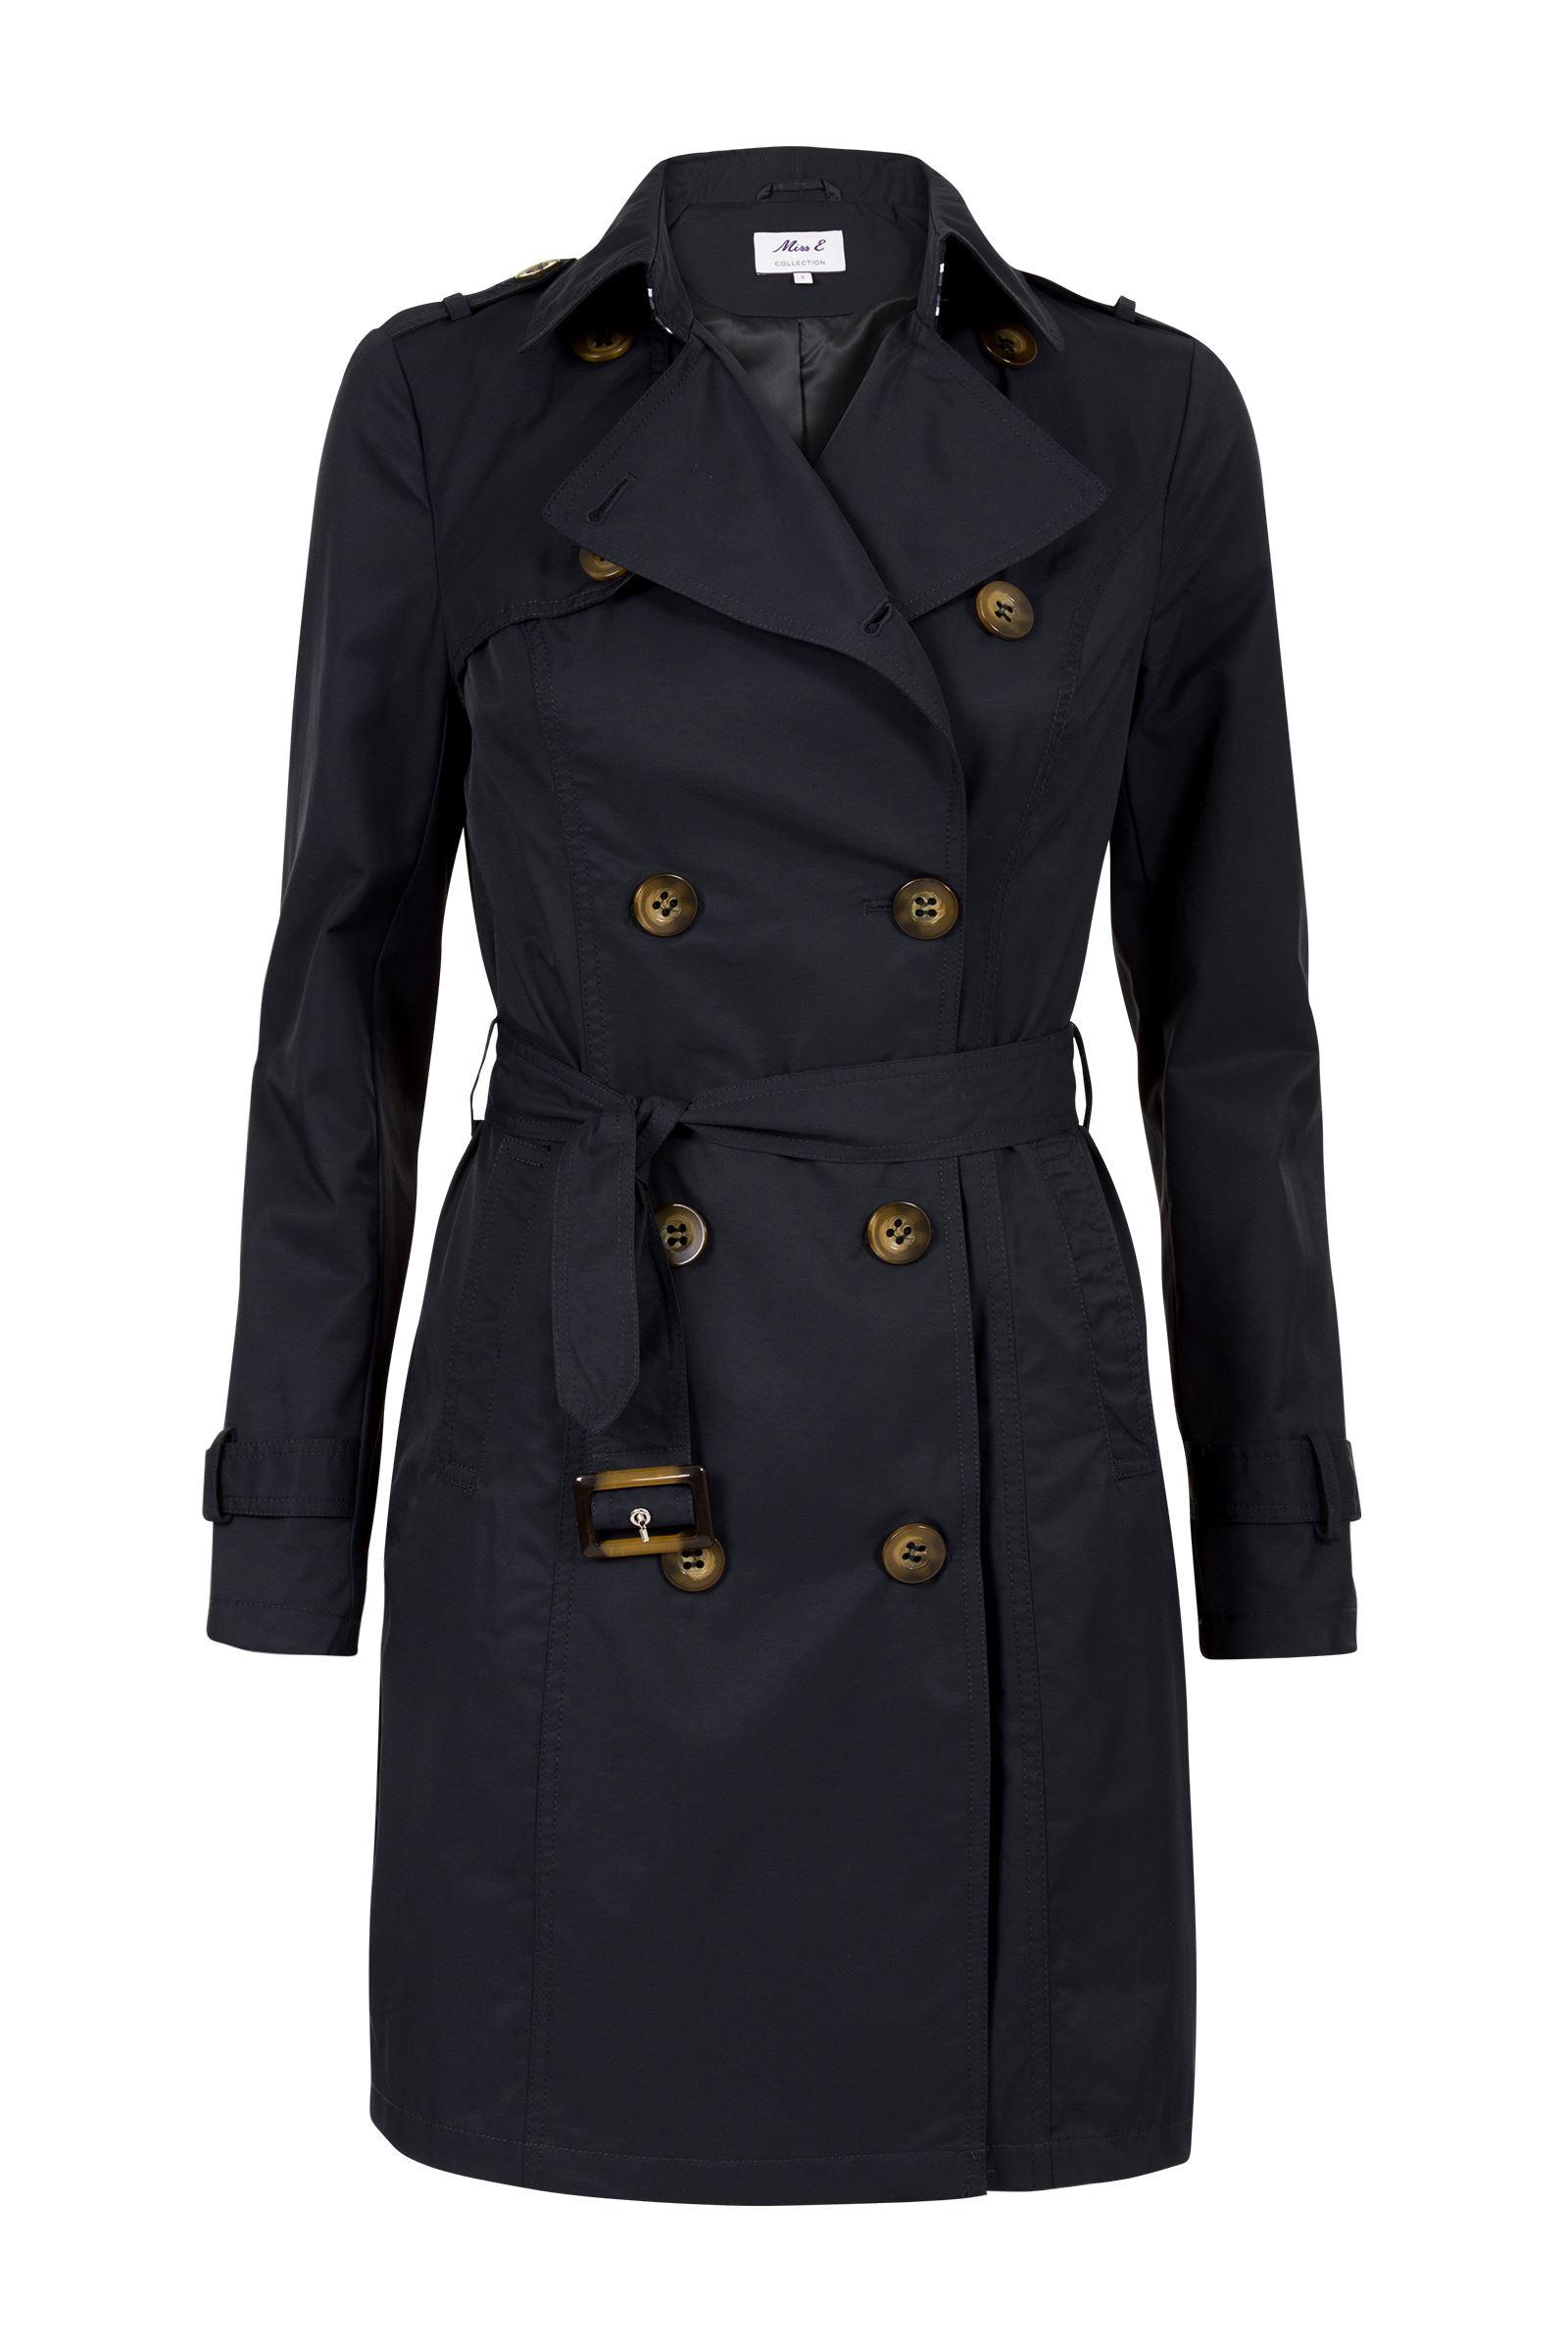 Zomerjas Dames.Dames Jassen Online Kopen Fashionchick Nl De Jassen Trends